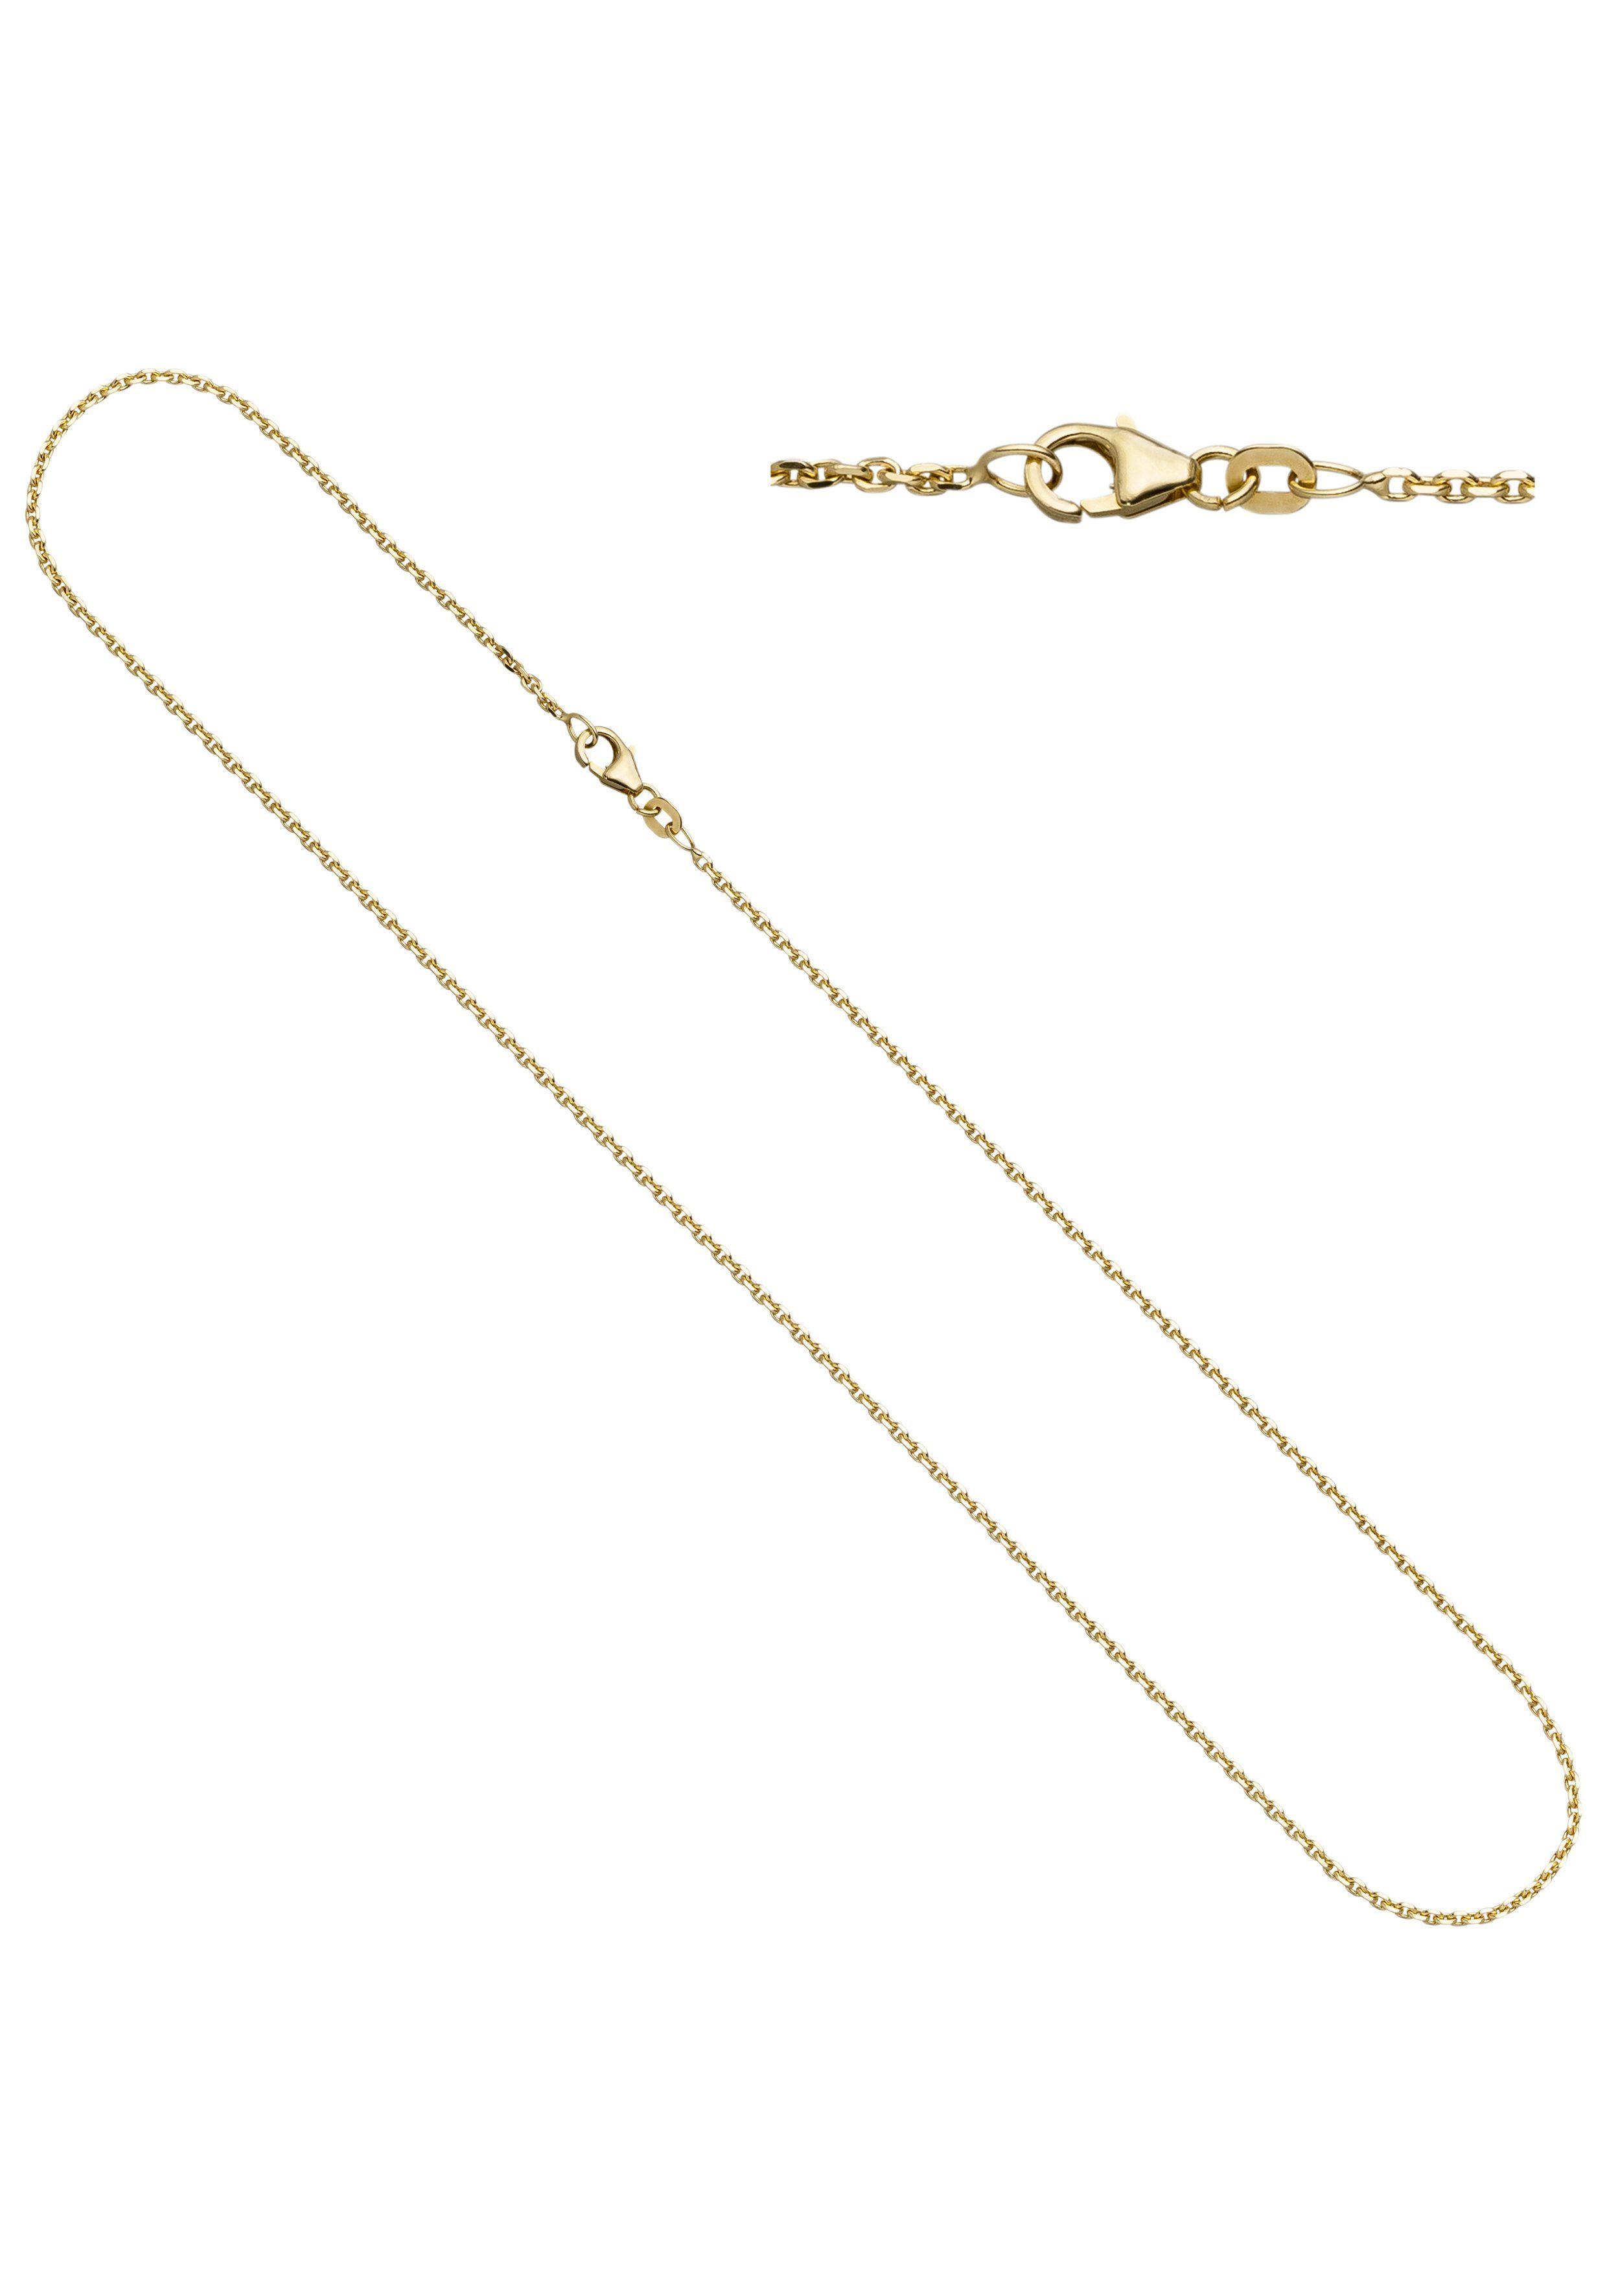 JOBO Goldkette Ankerkette 333 Gold diamantiert 38 cm 1,2 mm